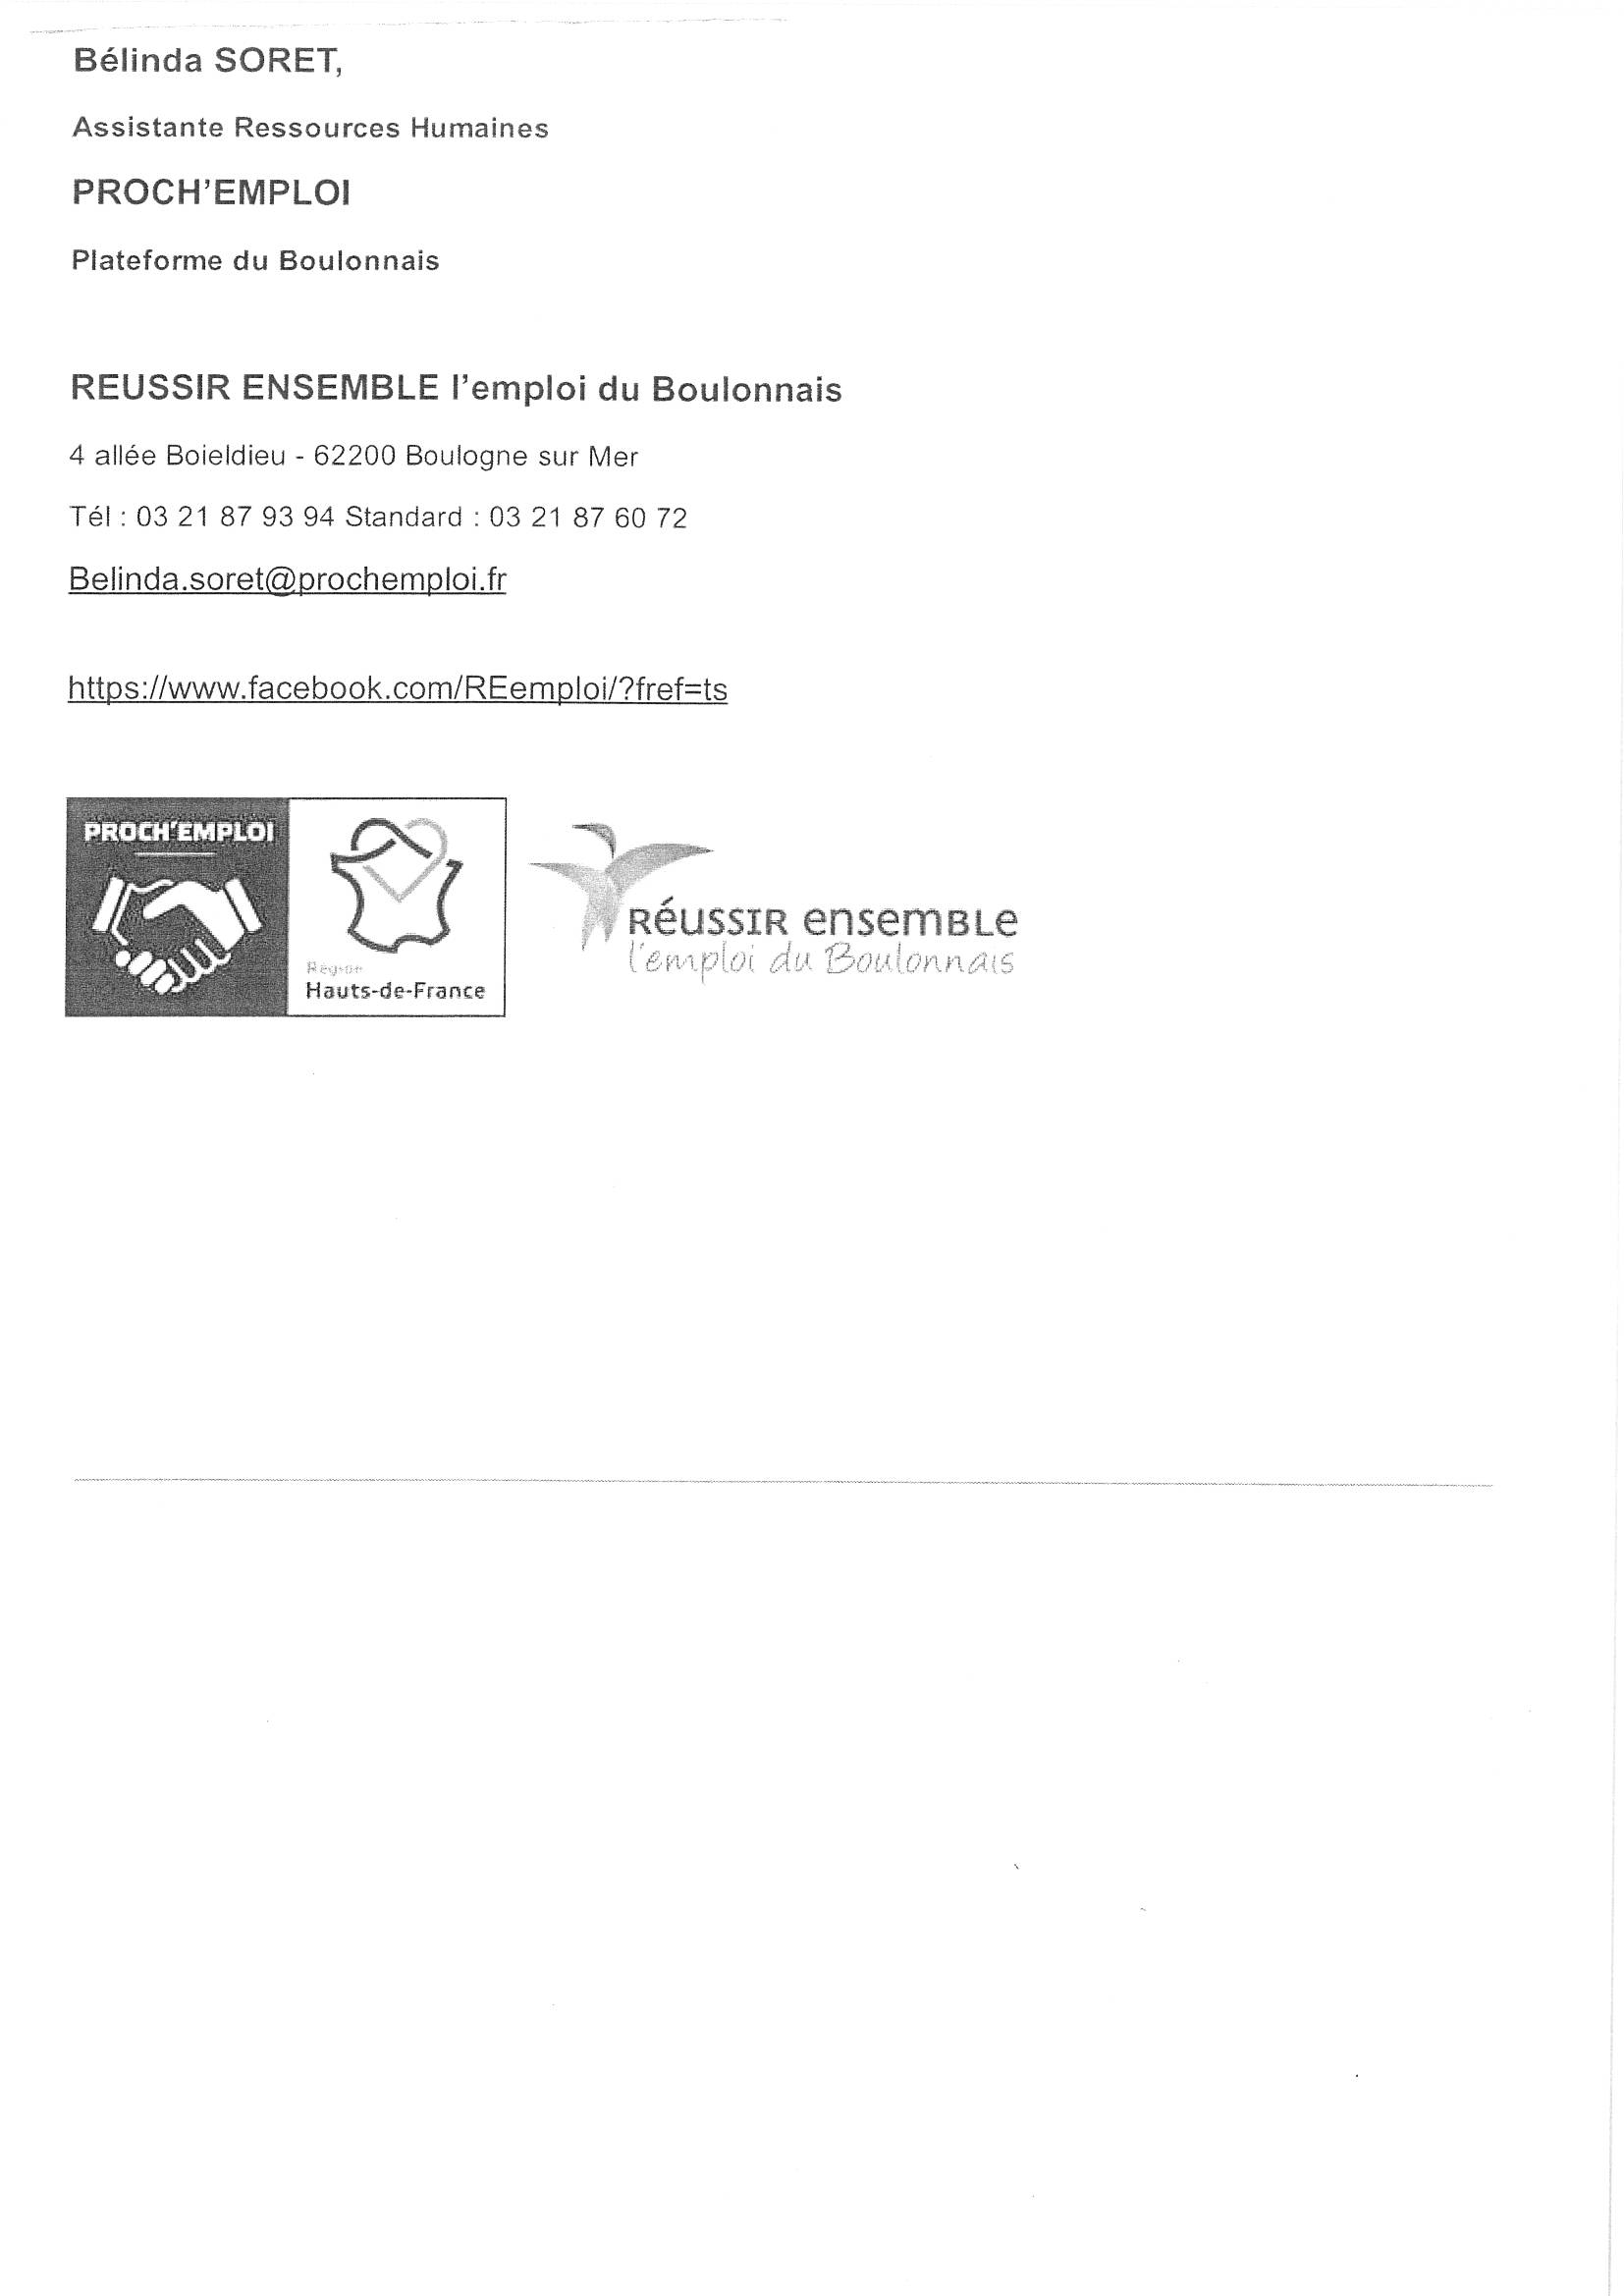 servicecivique_004.jpg